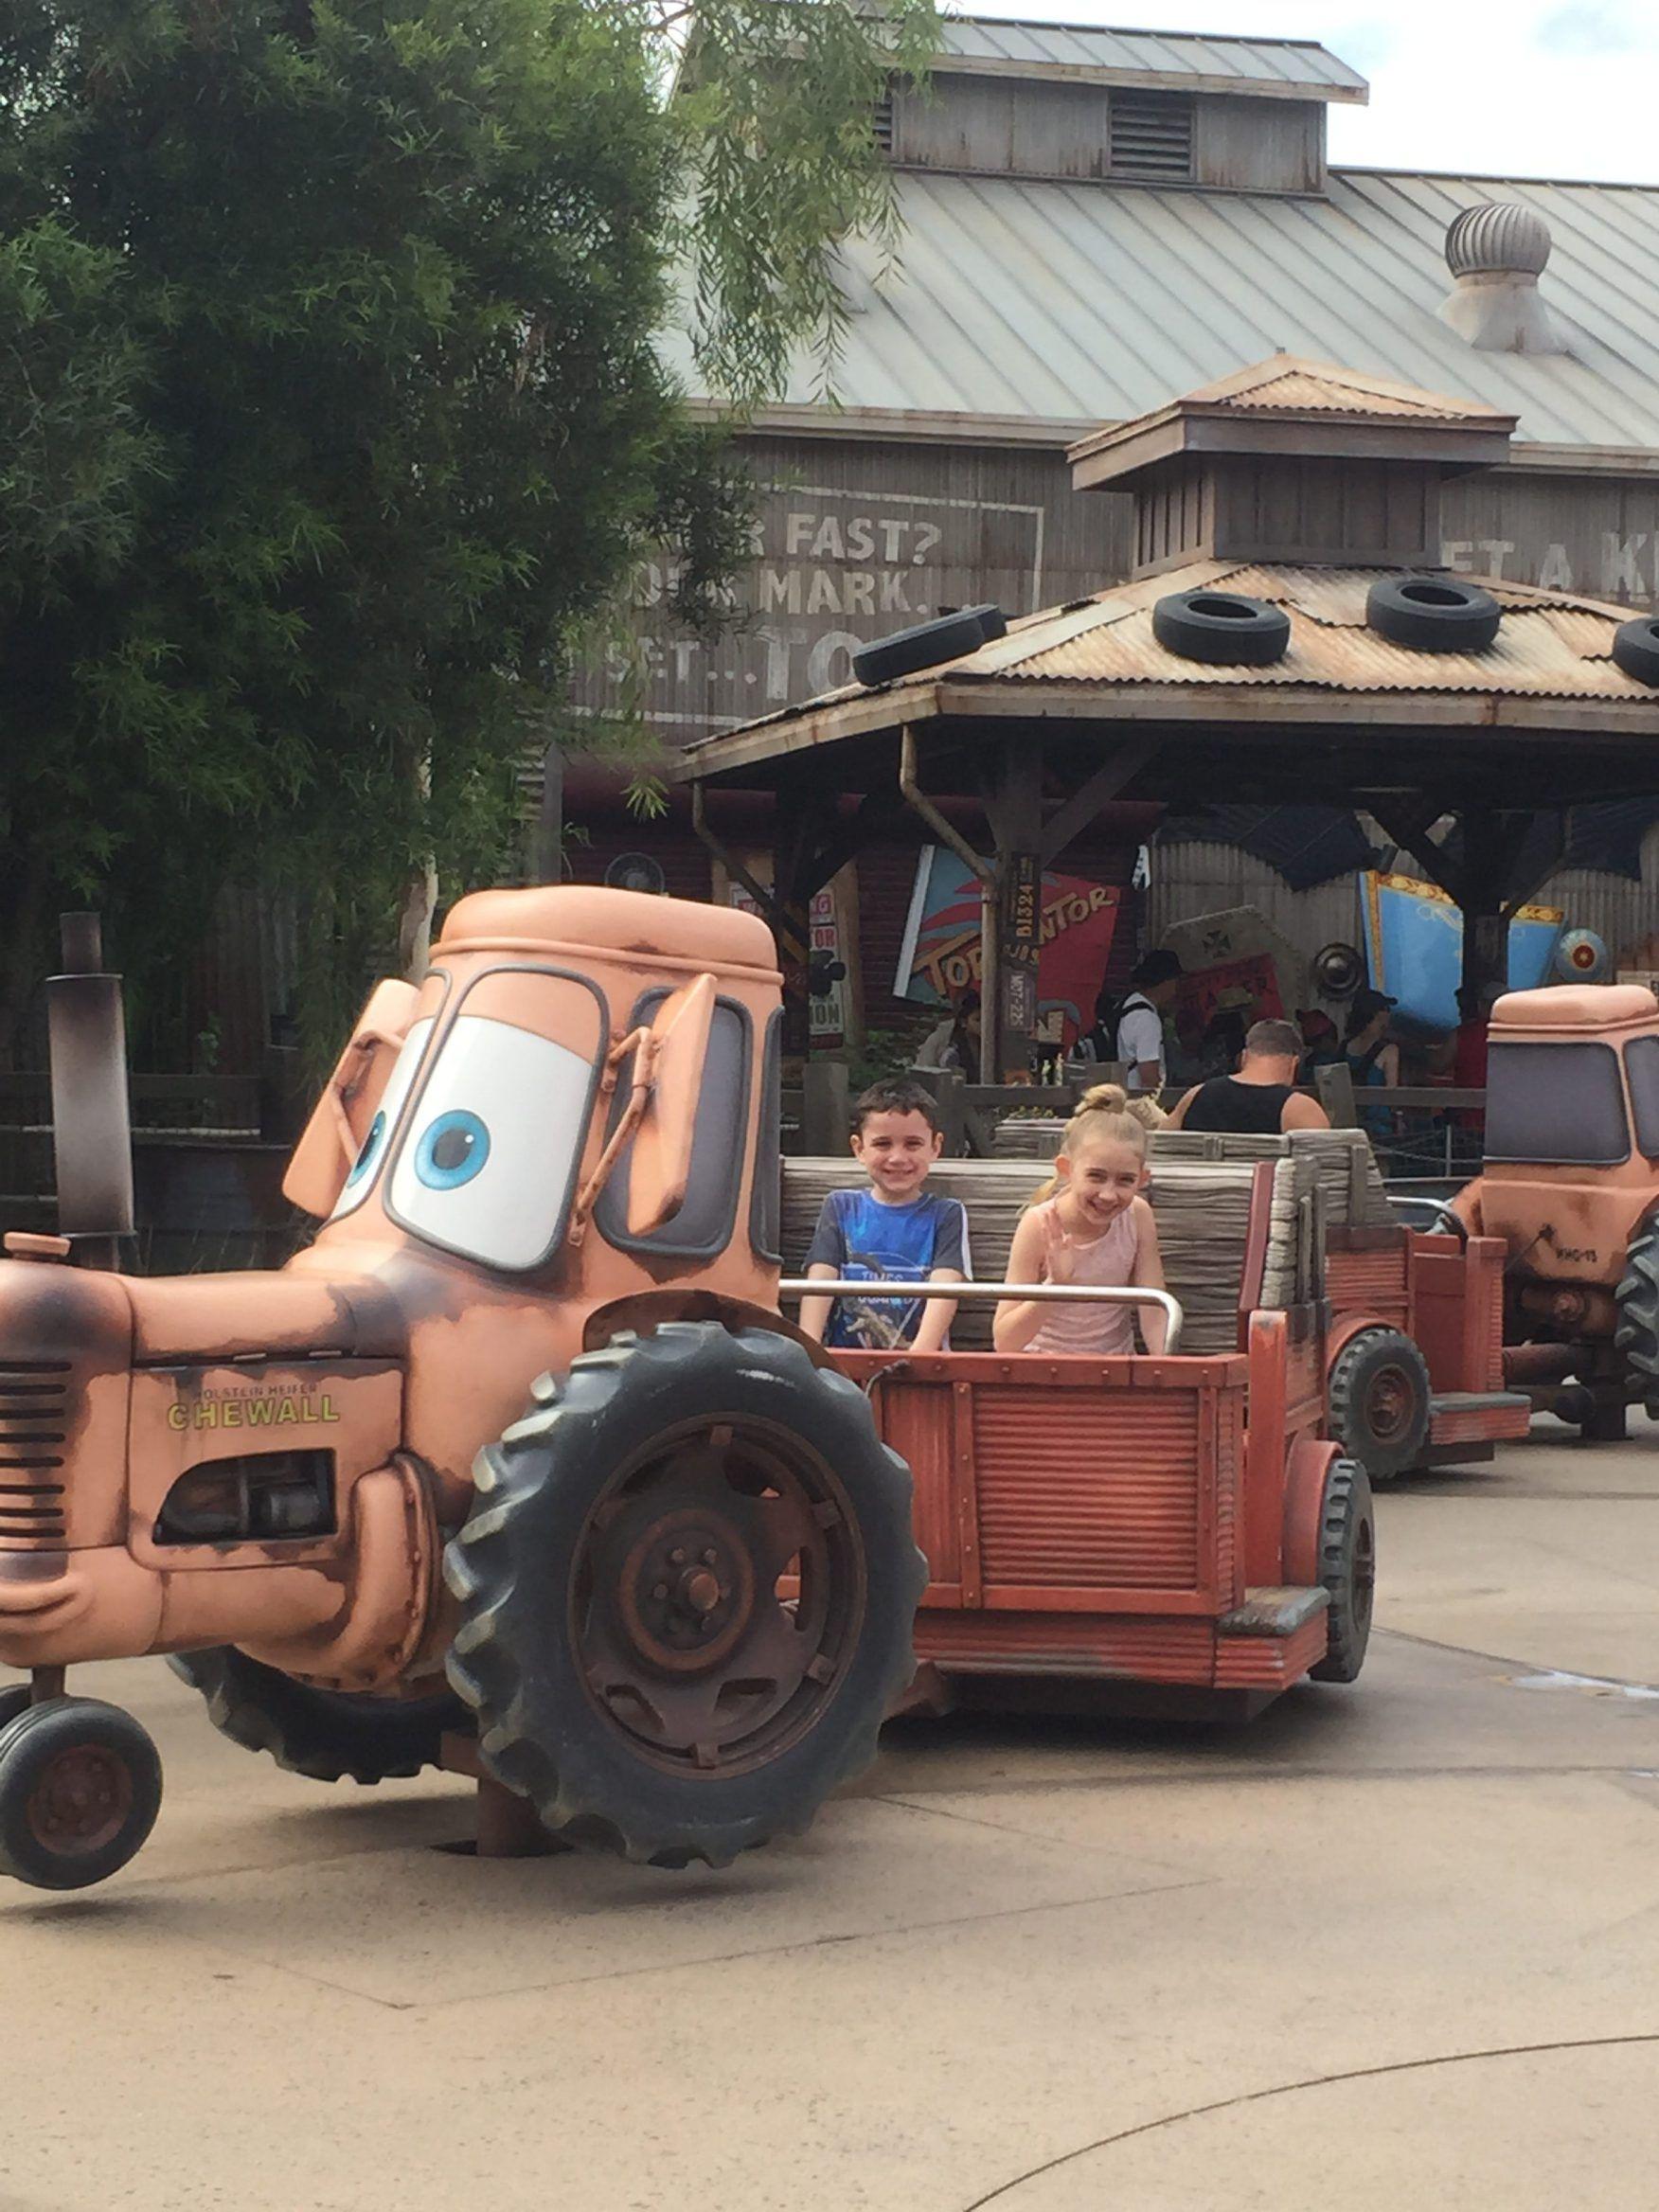 Disneylands California Adventure Park